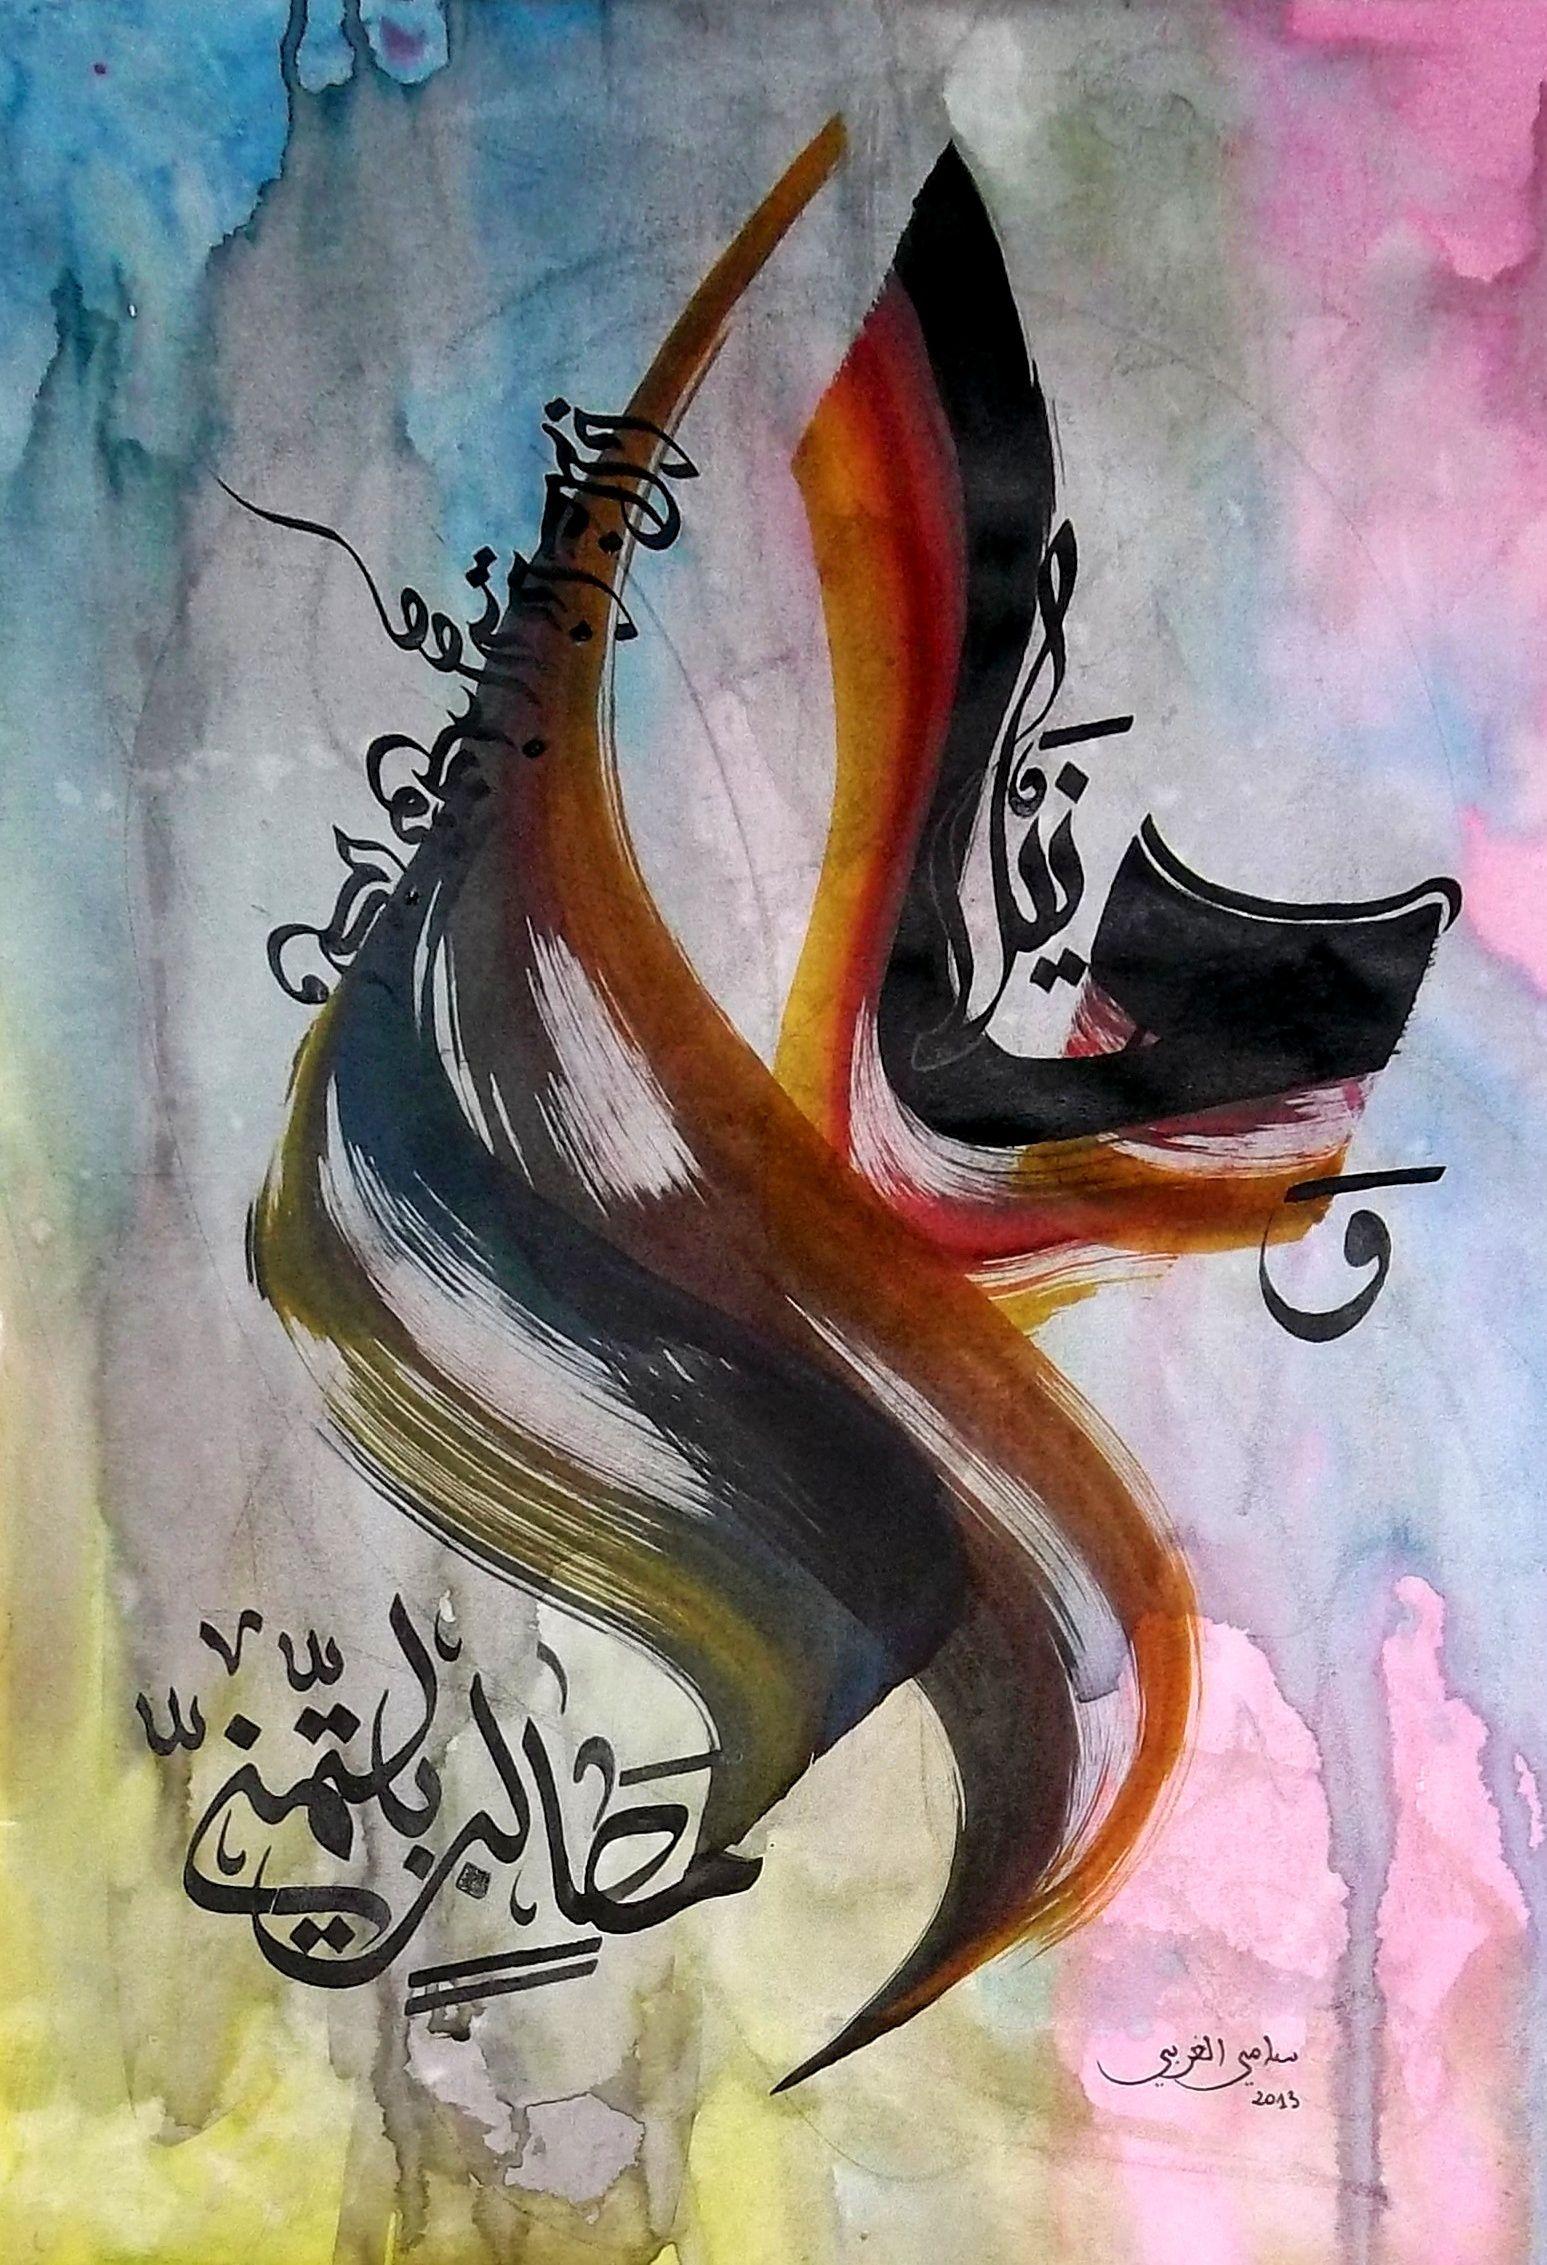 Arabic Calligraphy Meets Watercolor By Sami Gharbi From Tunisiawww Facebook Com Samicalligrapher وما نيل المطالب بالتمني ولكن تؤخذ الدنيا غلابا 35x50c Aquarela